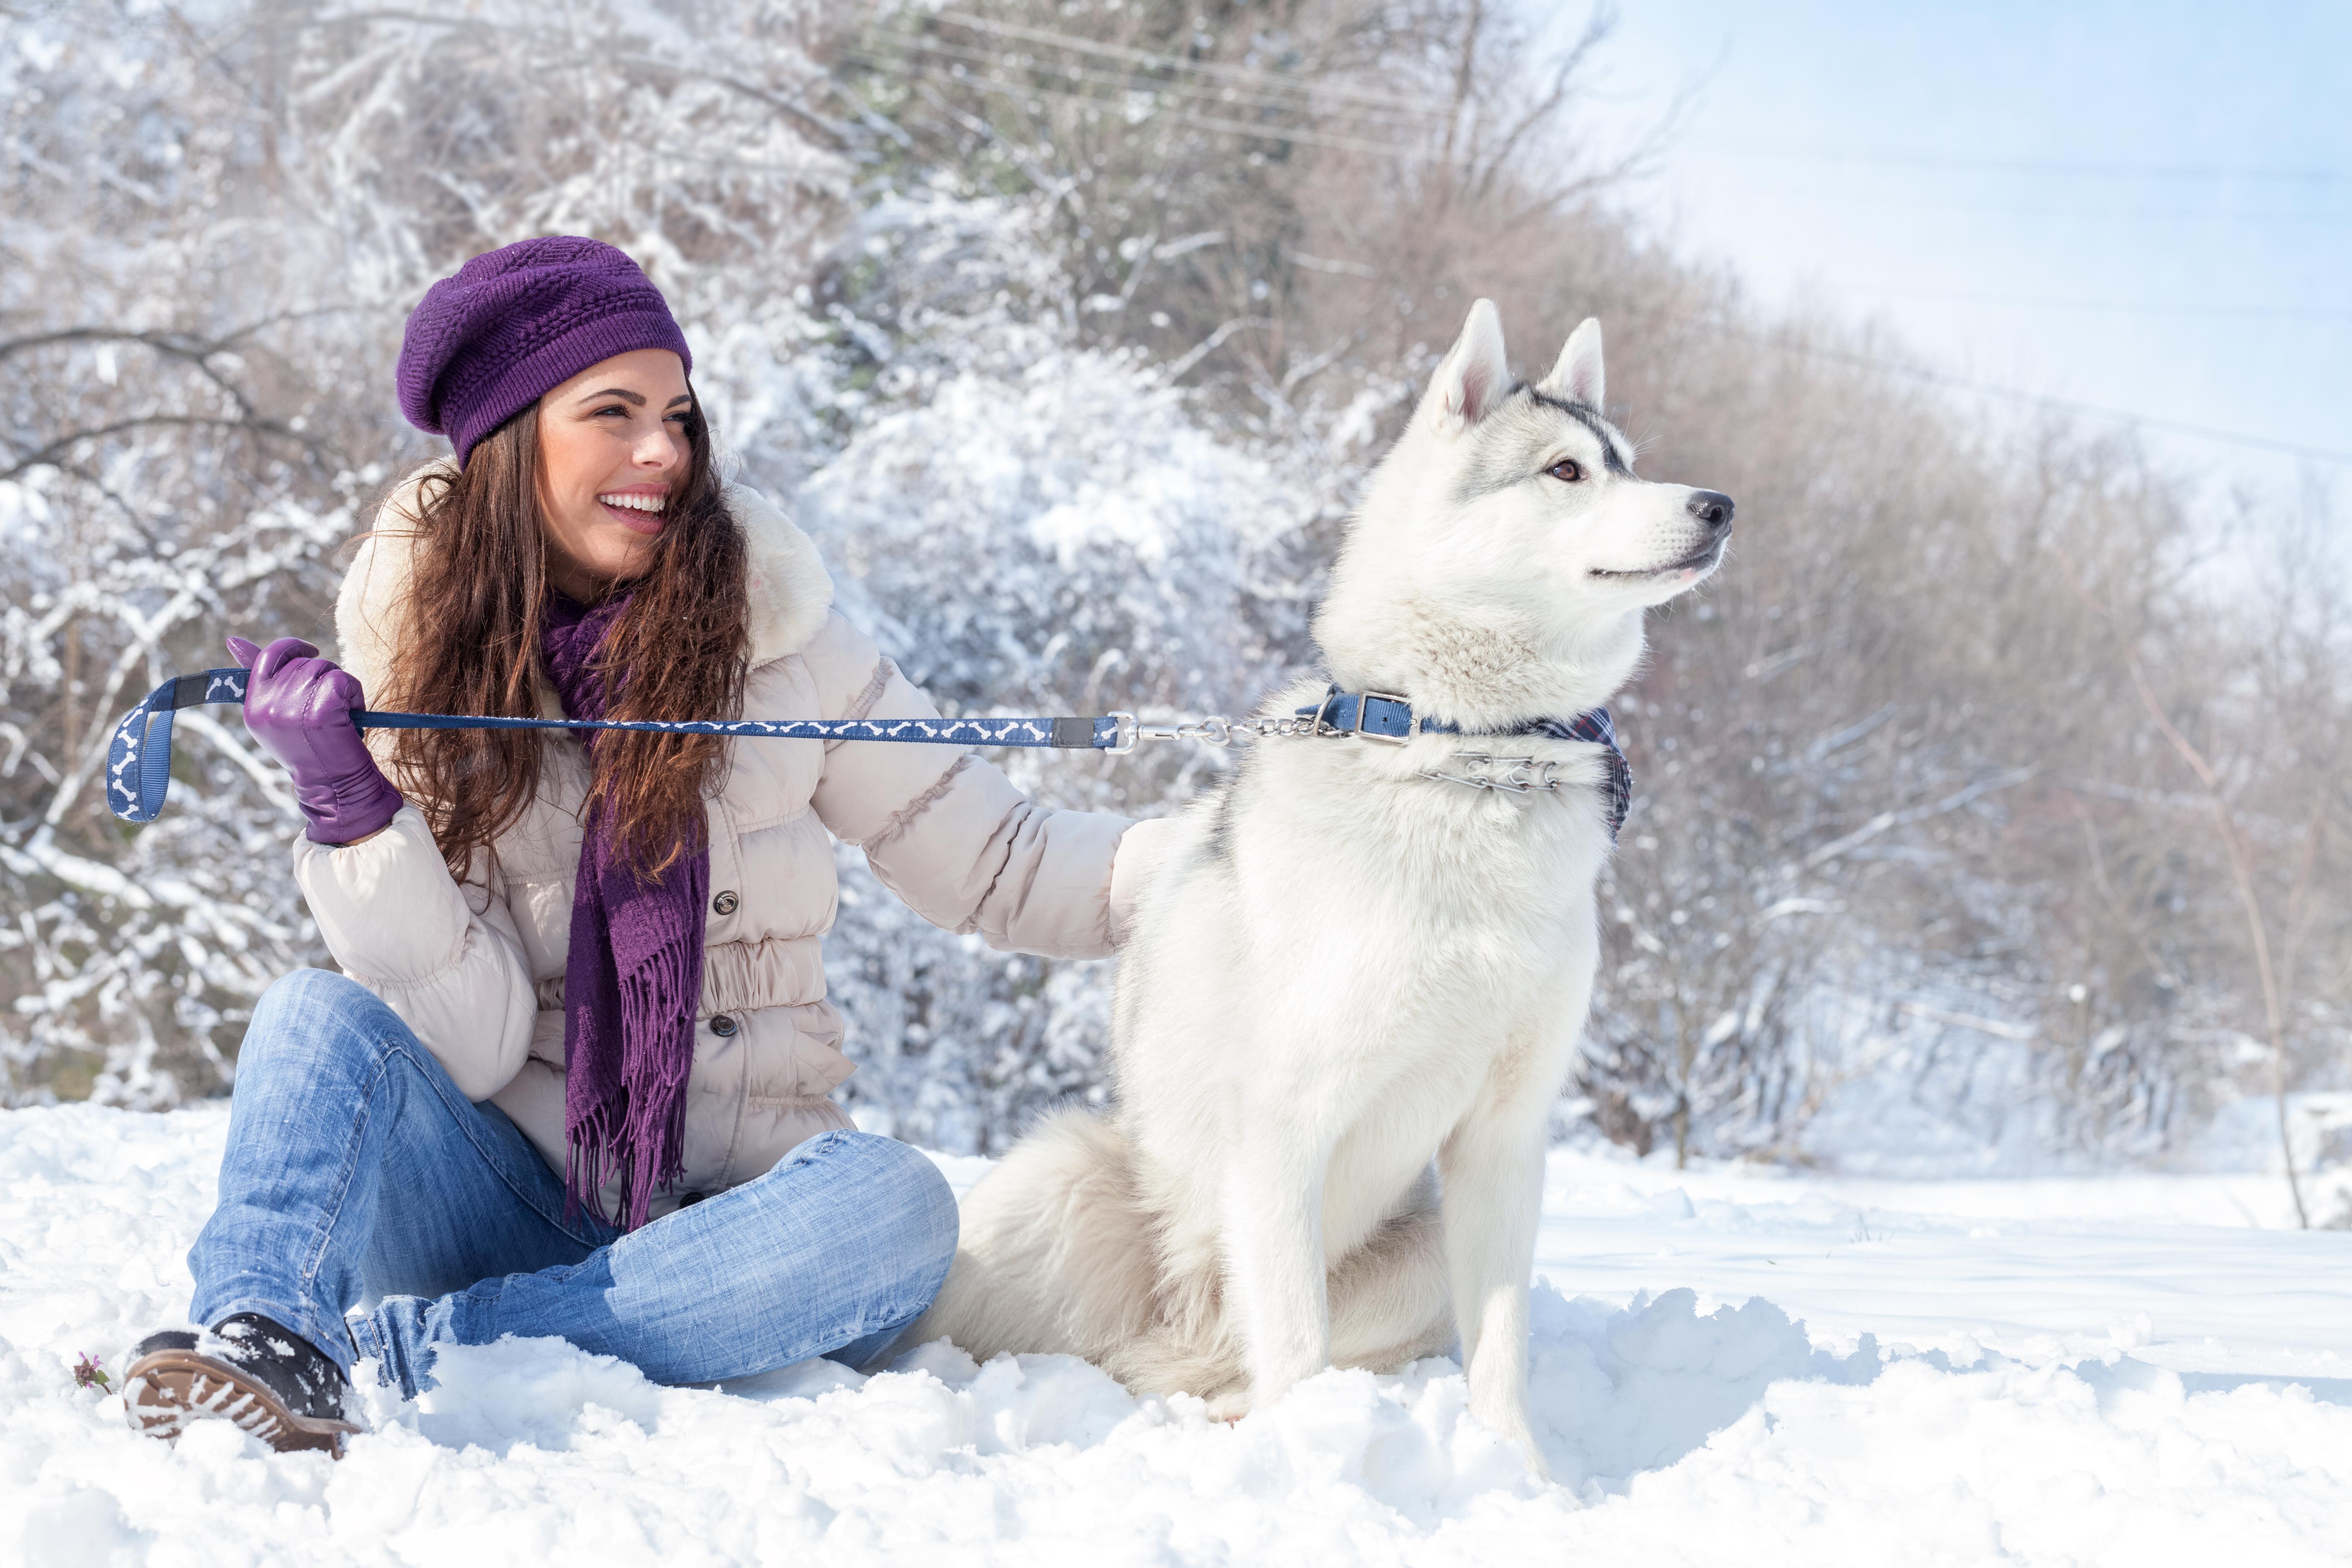 девушка брюнетка зима снег winter snow  № 2816662 загрузить